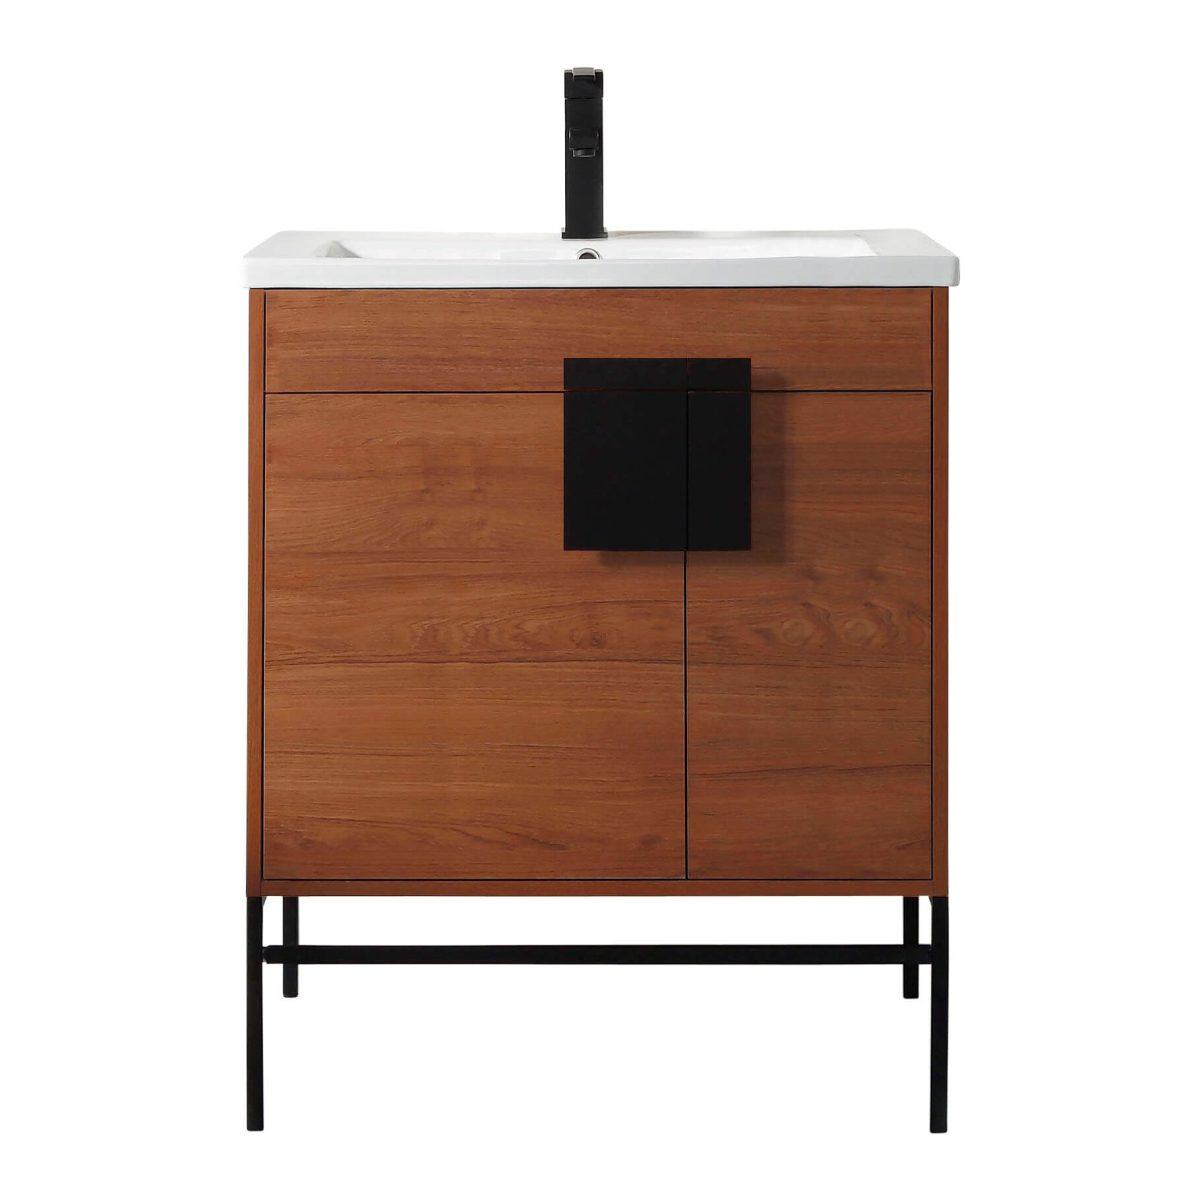 "Shawbridge 30"" Modern Bathroom Vanity  Spicy Walnut with Black Hardware"